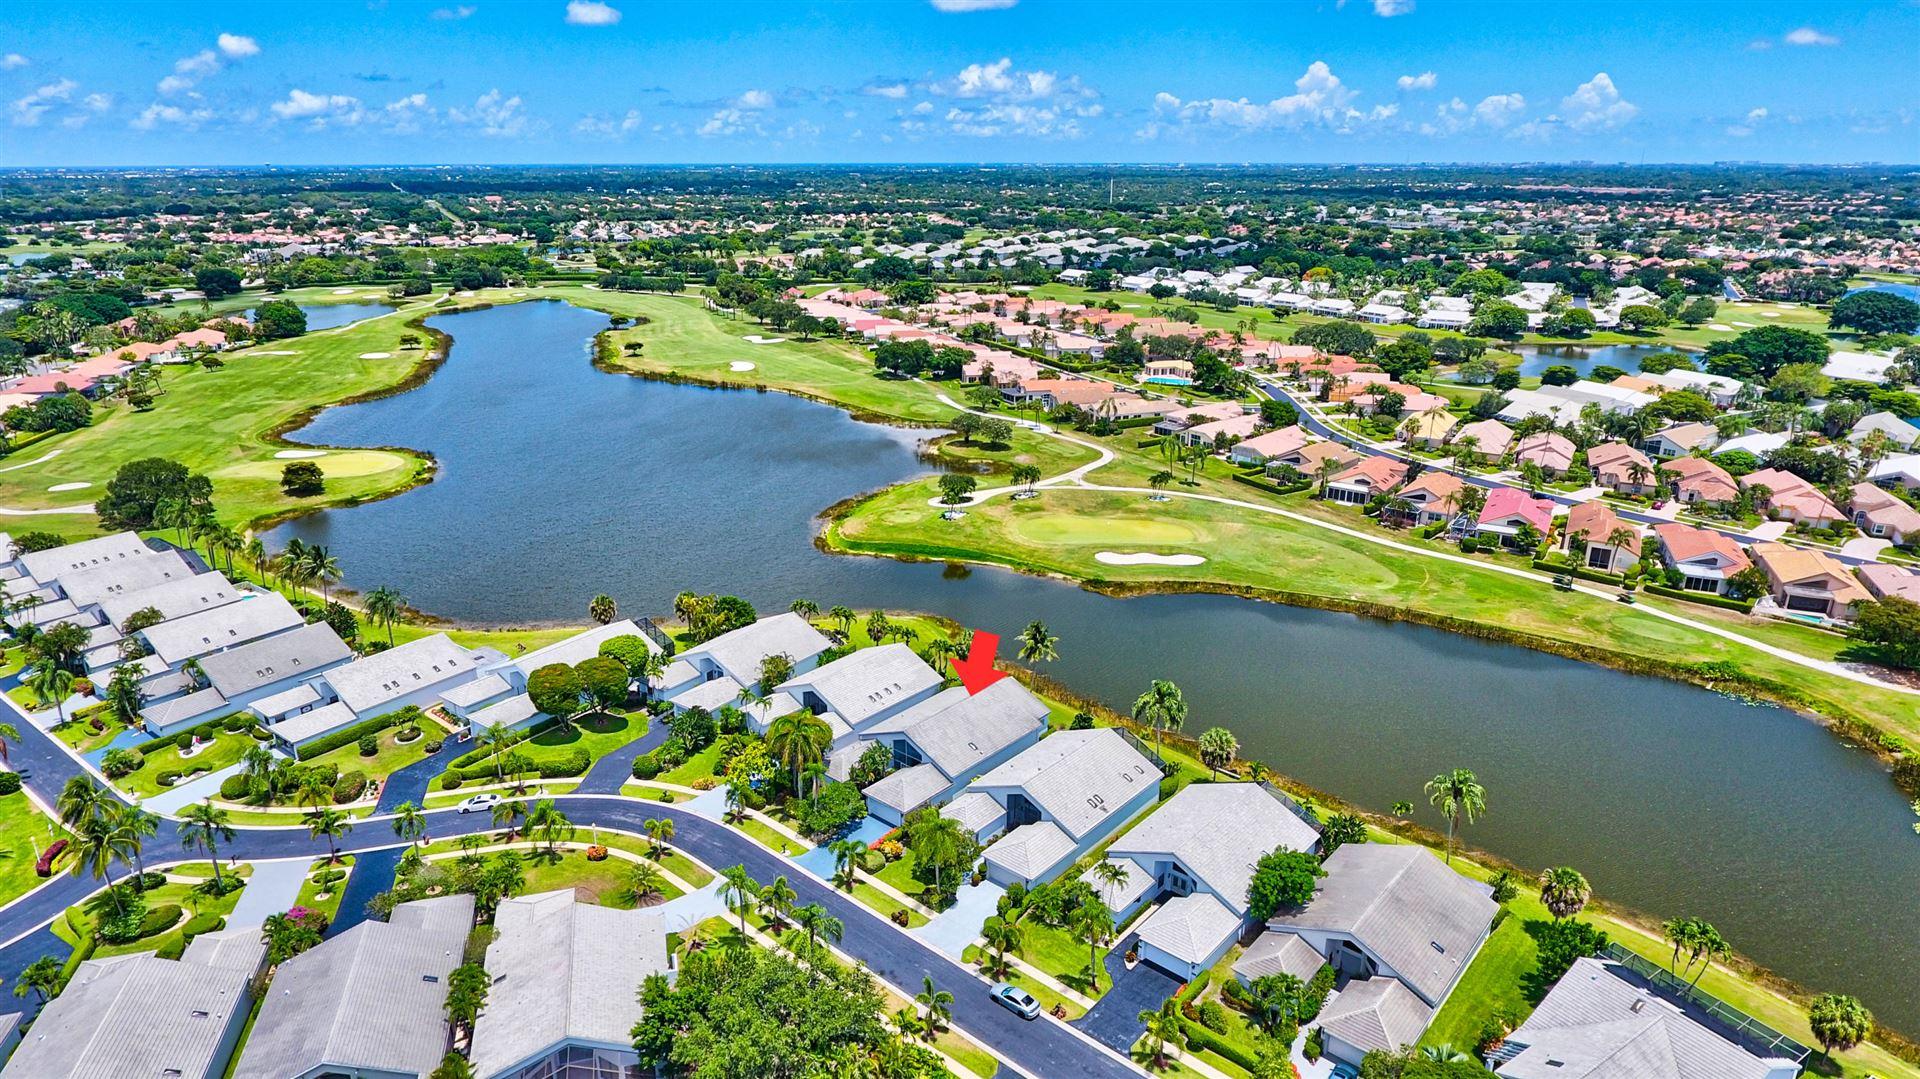 11516 Victoria Drive, Boynton Beach, FL 33437 - MLS#: RX-10723366